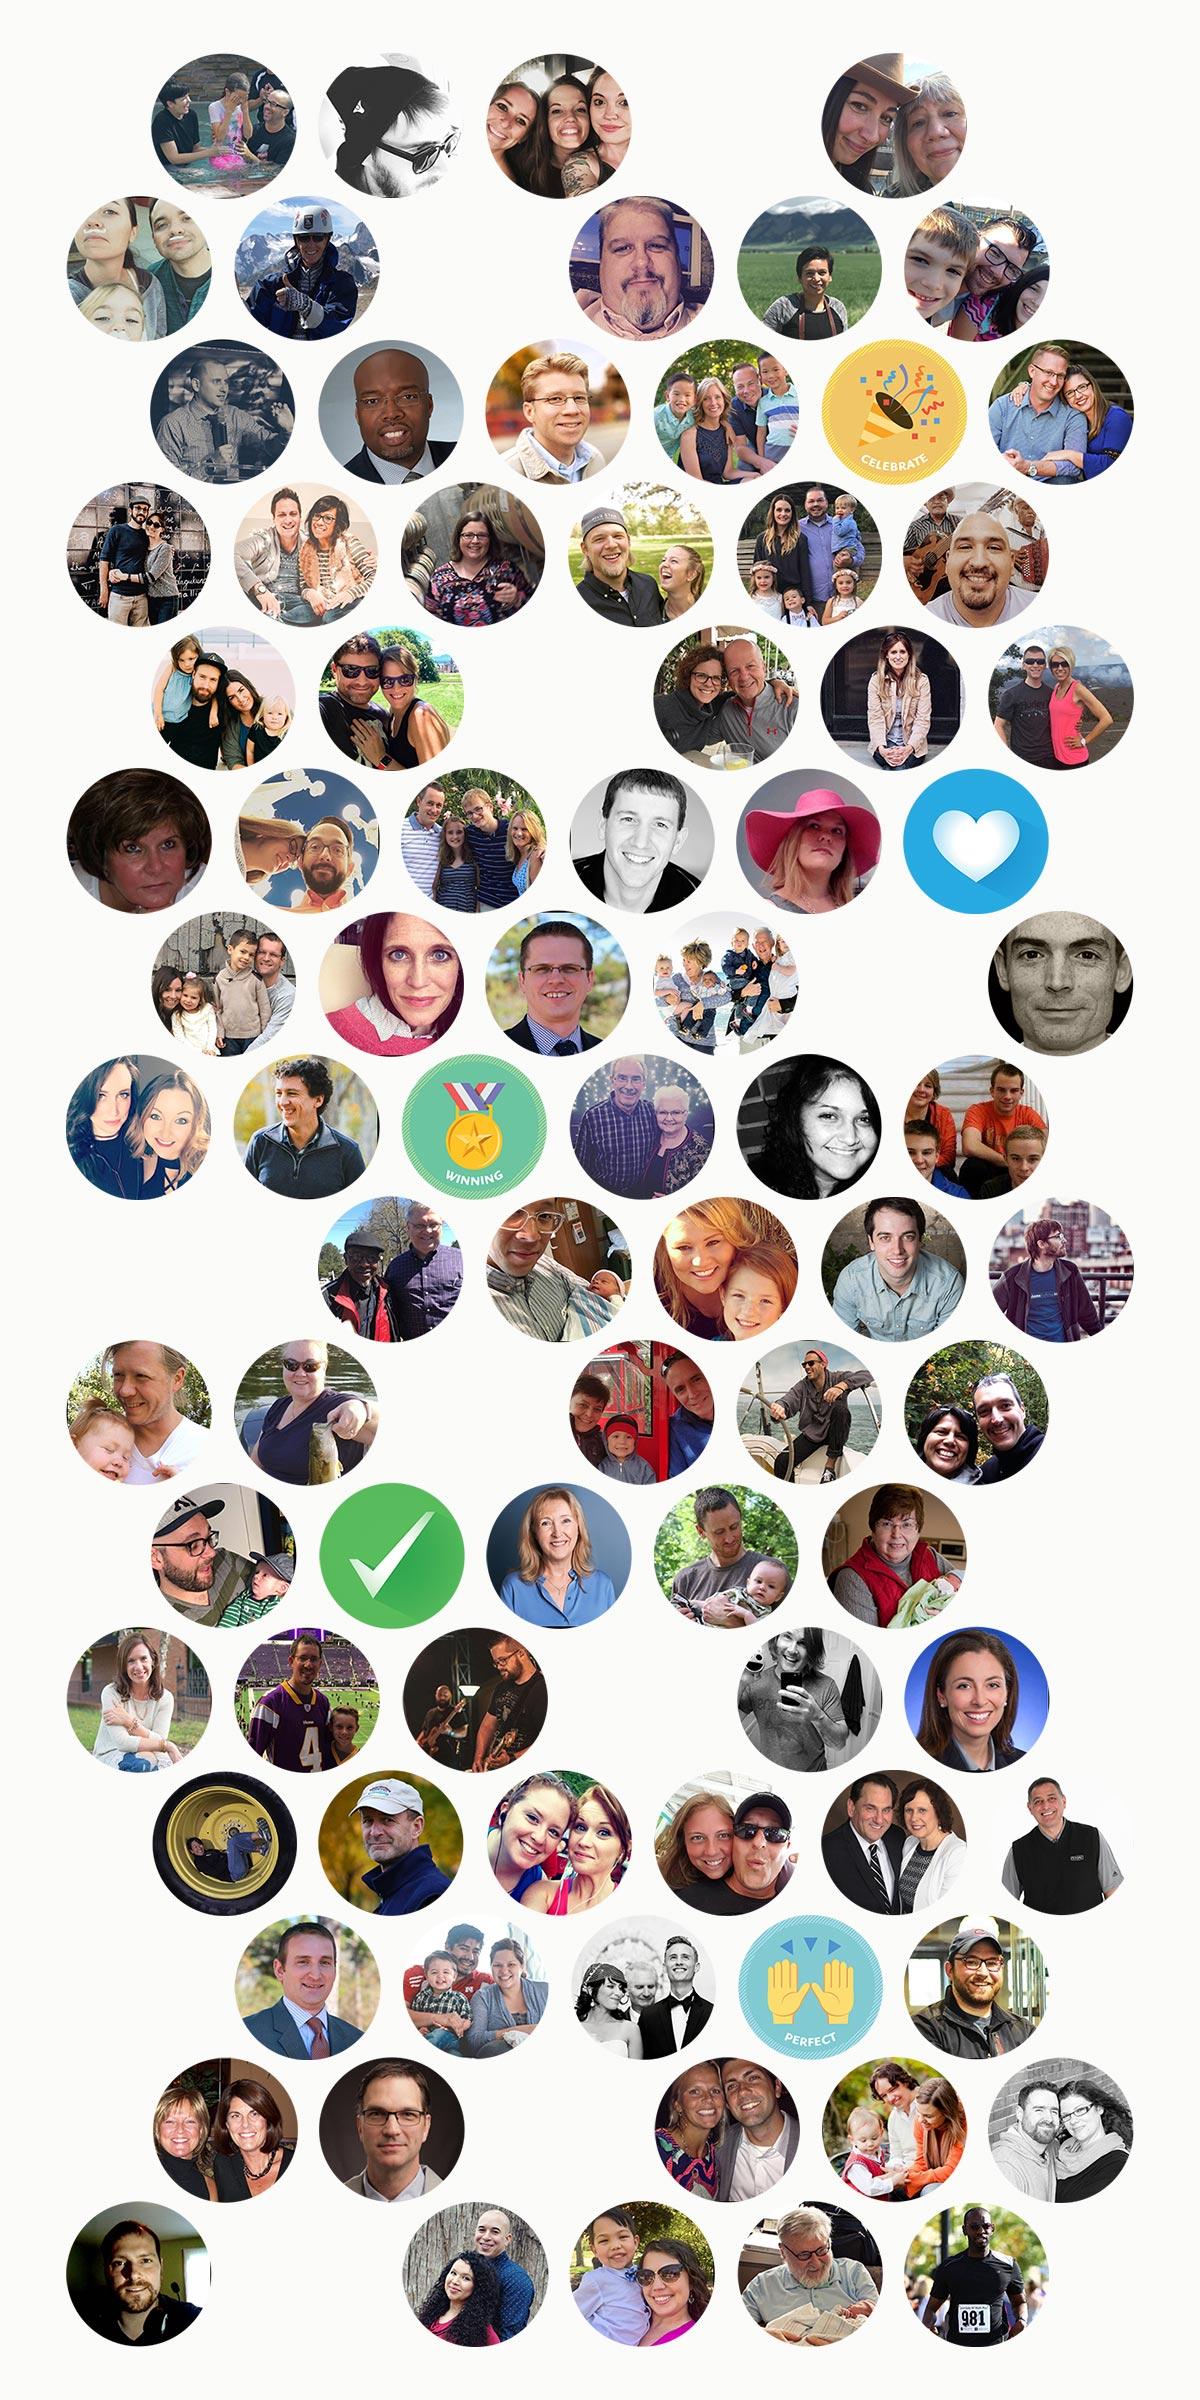 profiles_grid.jpg